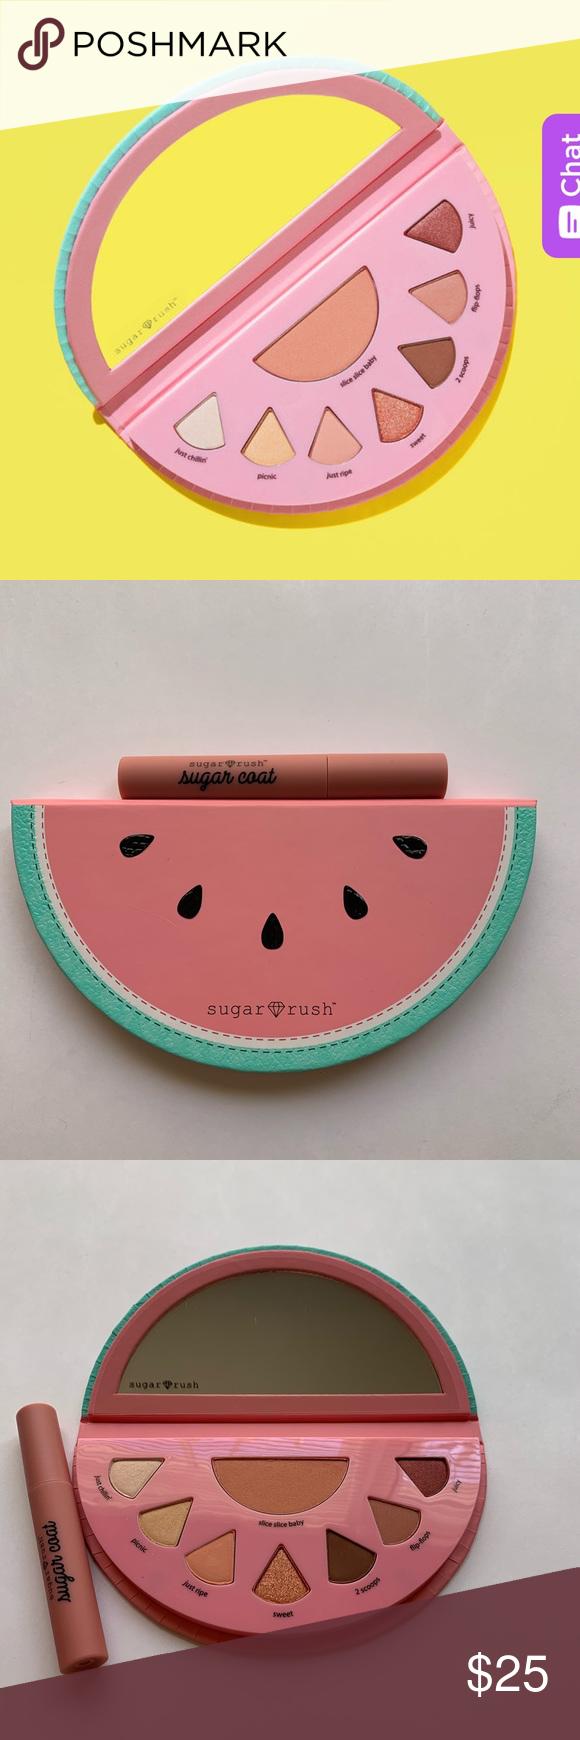 Tarte sugar rush eye palette and liquid lipstick NWT